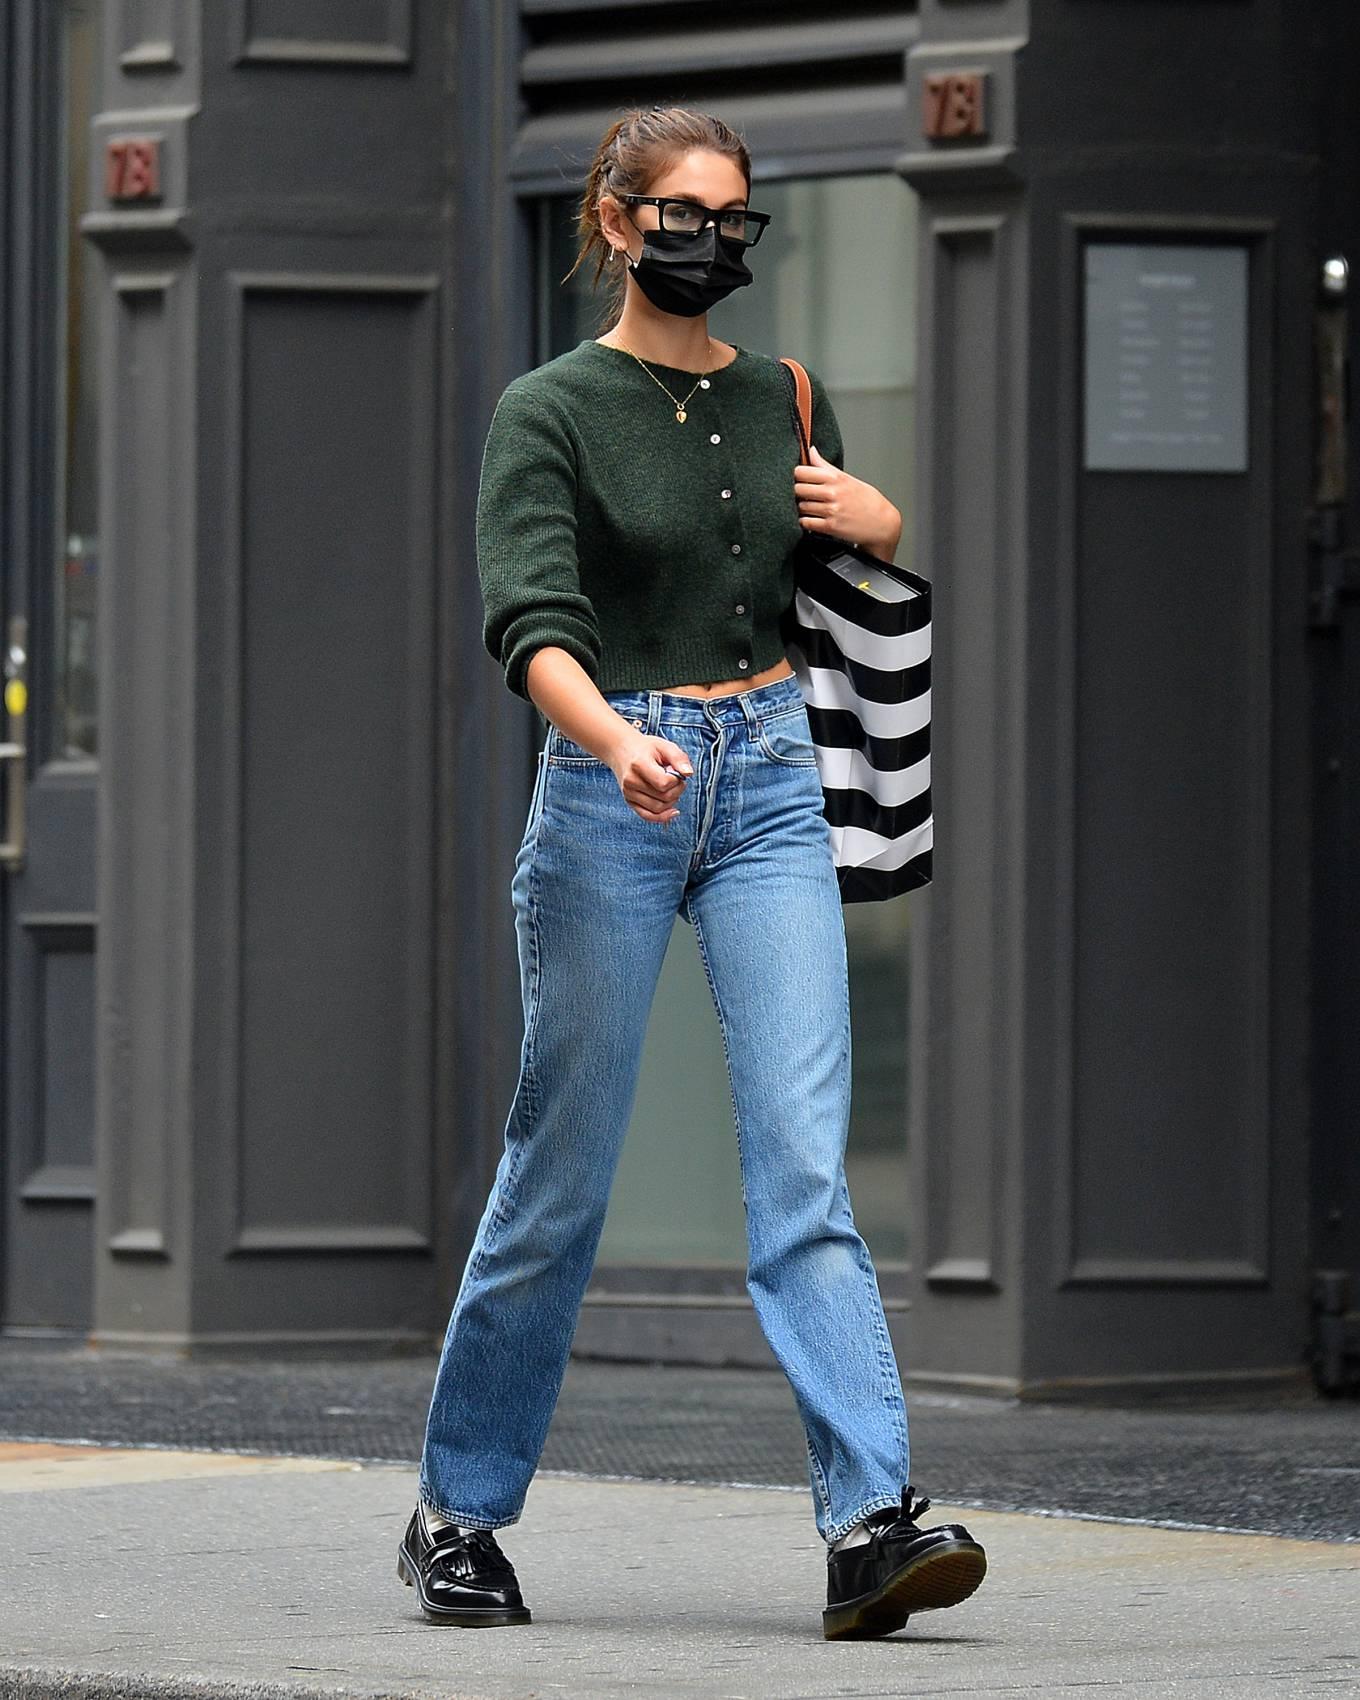 Kaia Gerber, black boots, leather, Adrian boots, black shoulder bag, olive green top, round, black sunglasses, blue jeans. Kaia Gerber rocking round black leather boots by Adrian